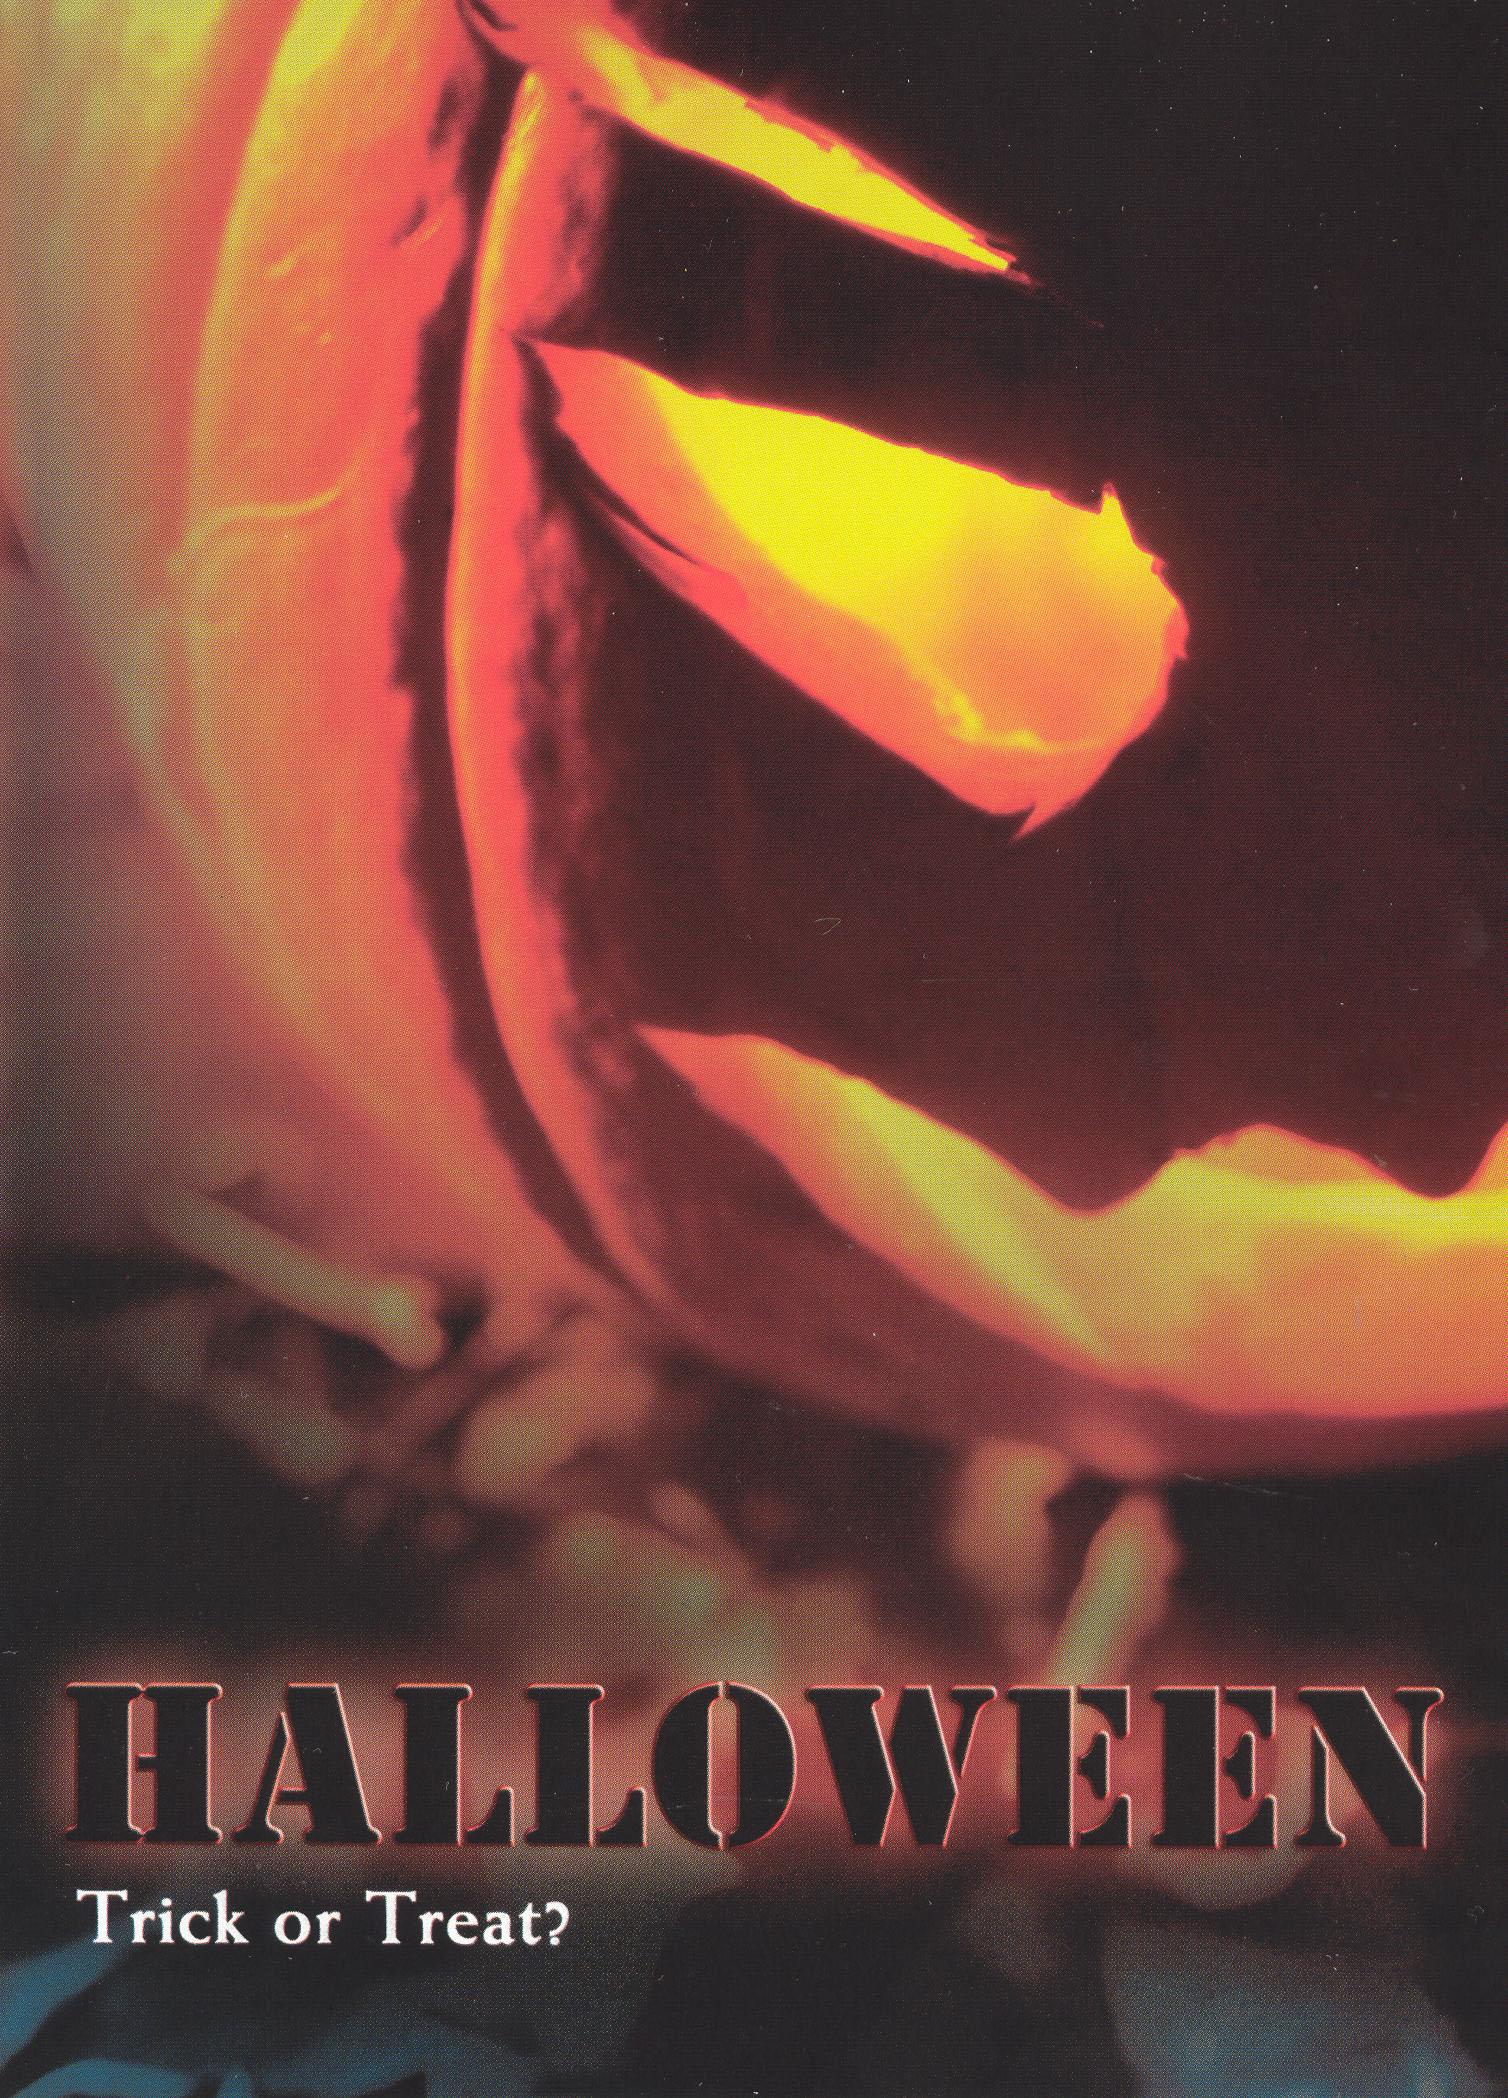 Halloween: Trick or Treat?